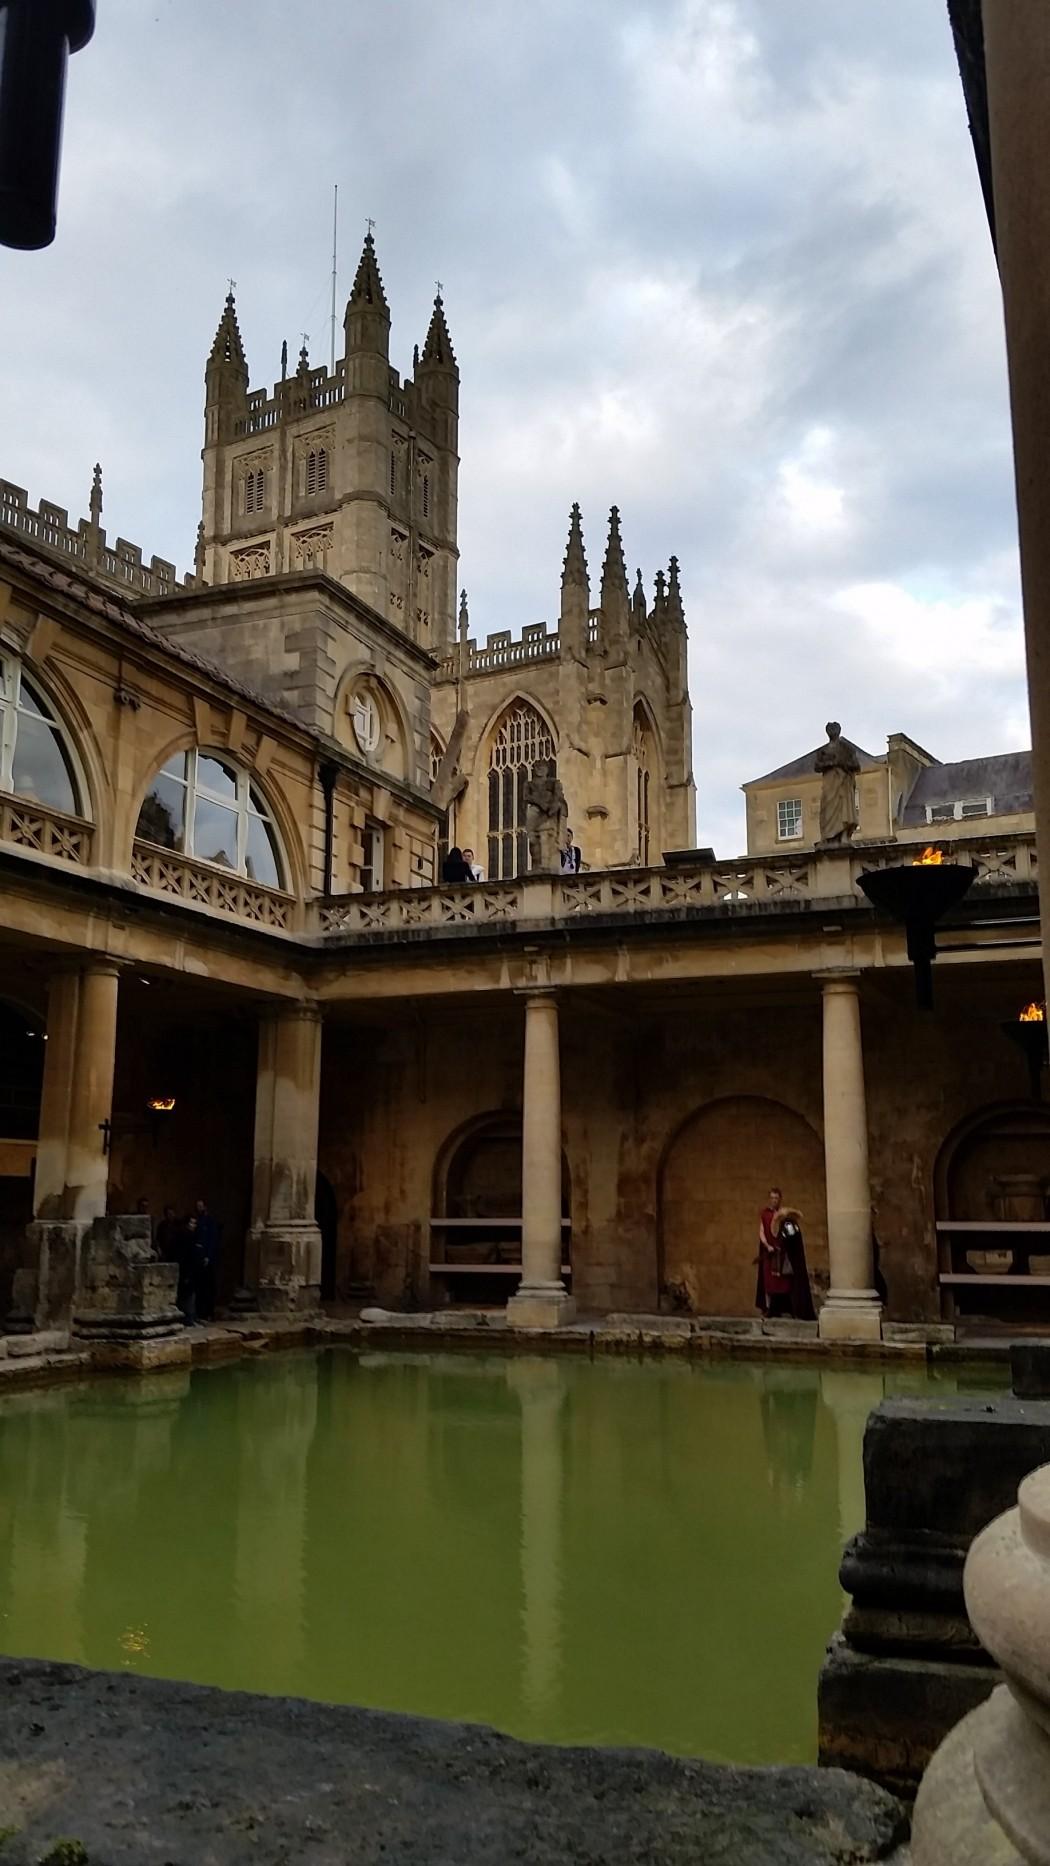 Touring the Baths